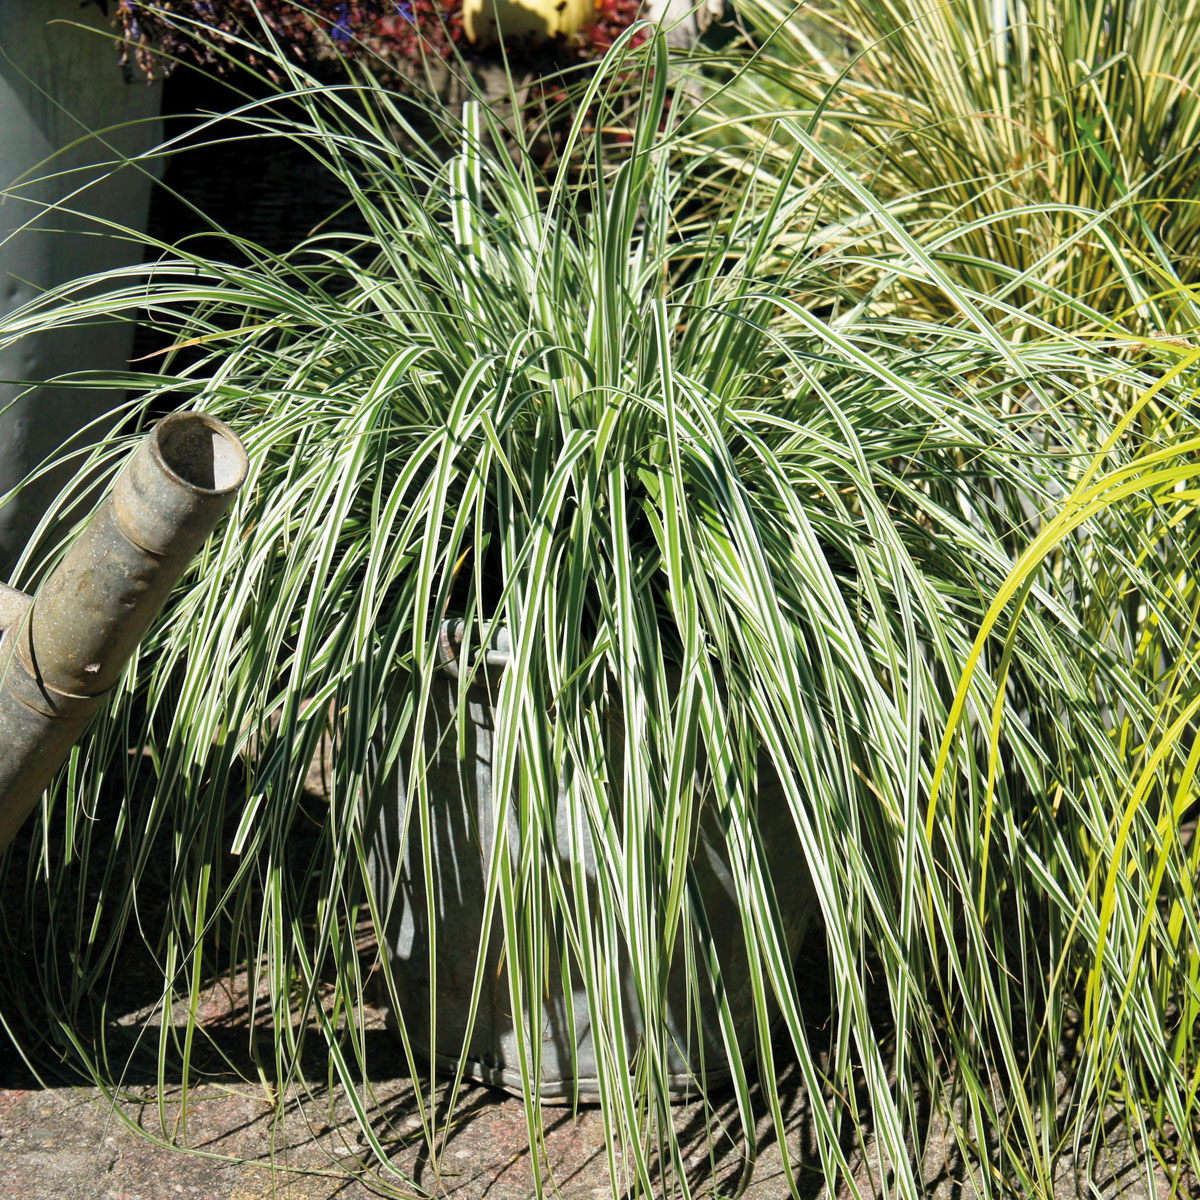 Carex - oshimensis - Everest - Fiwhite